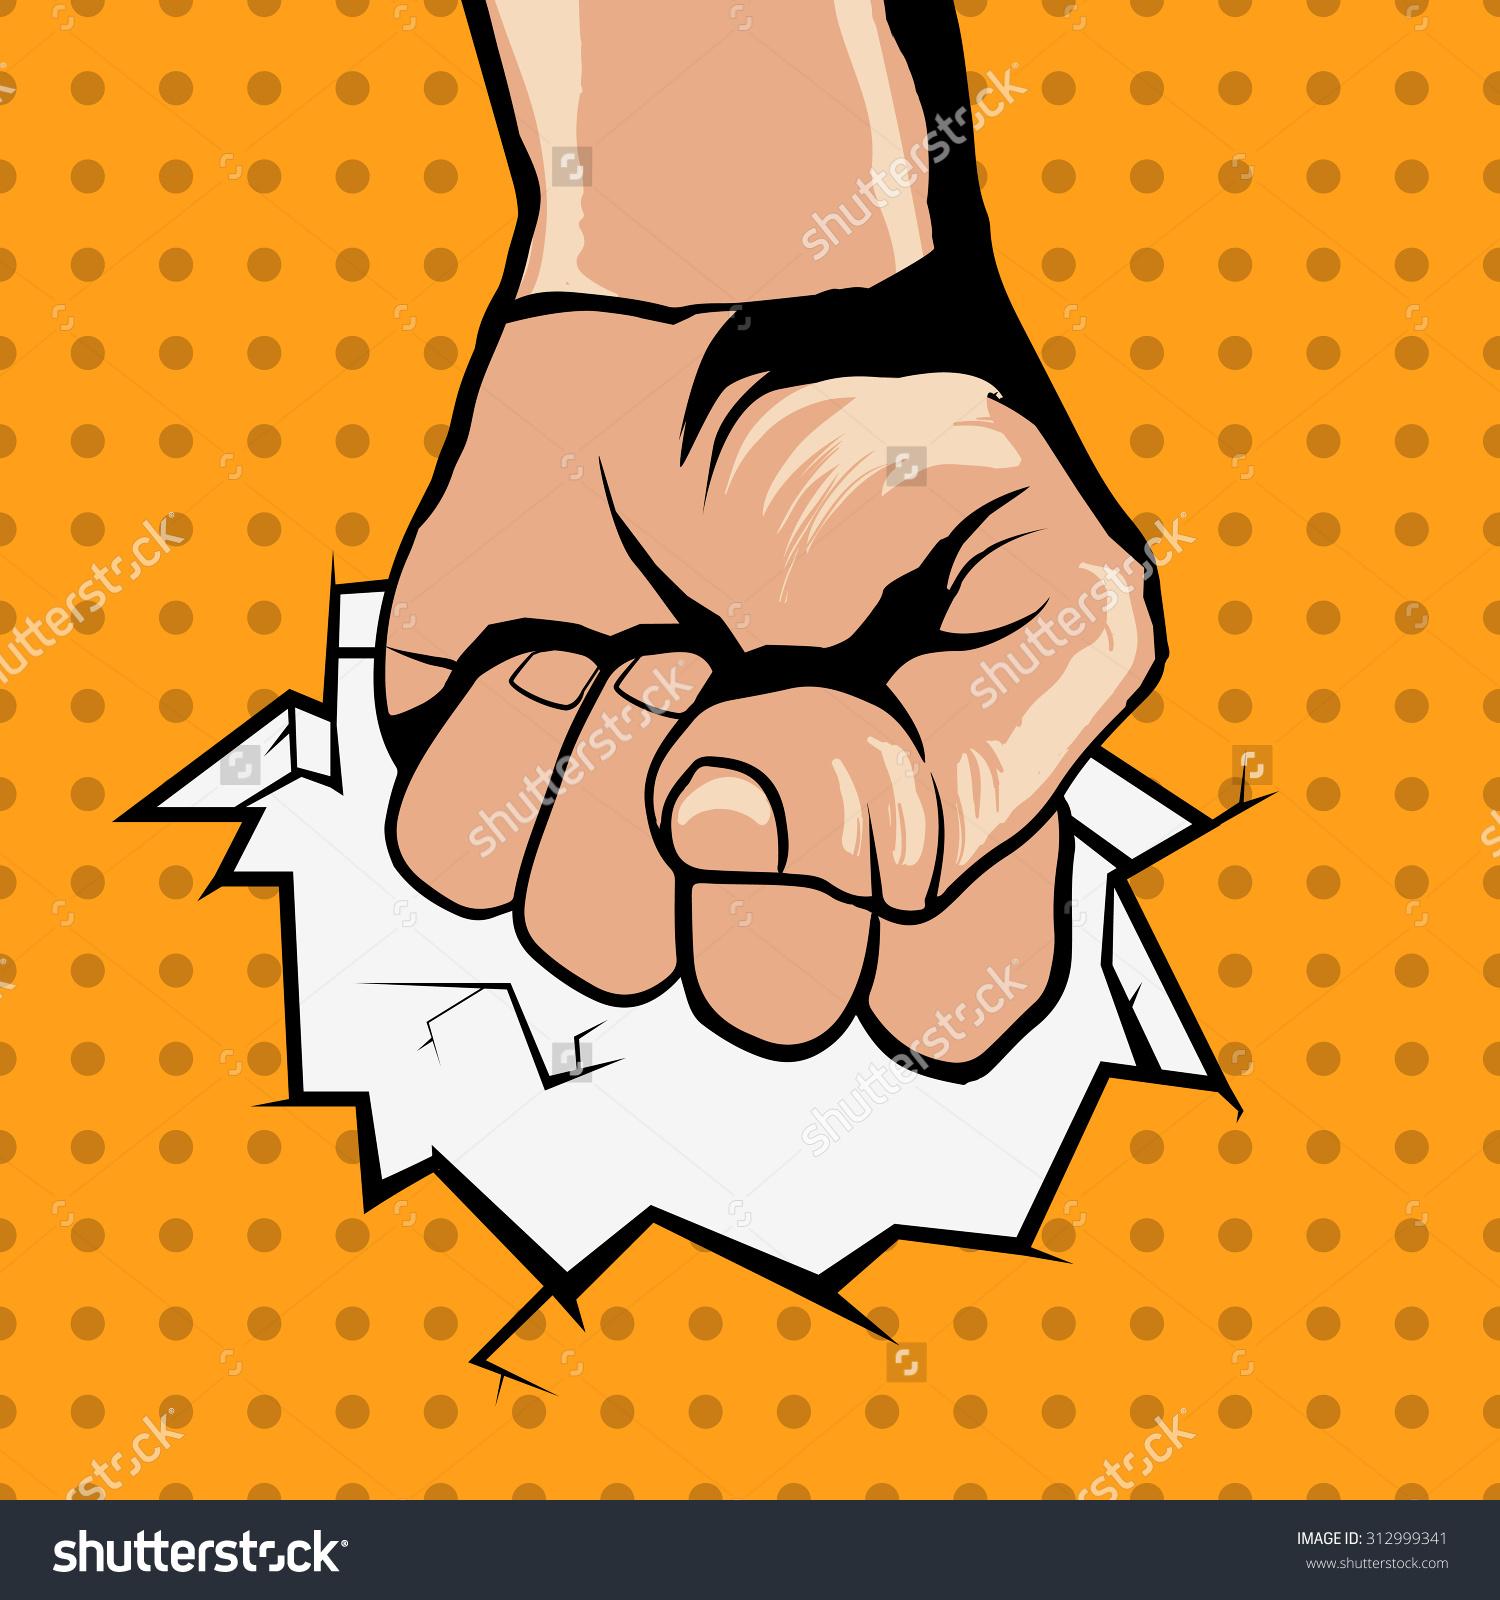 Fighting Hand Revolution Poster Popart Style Stock Vector.